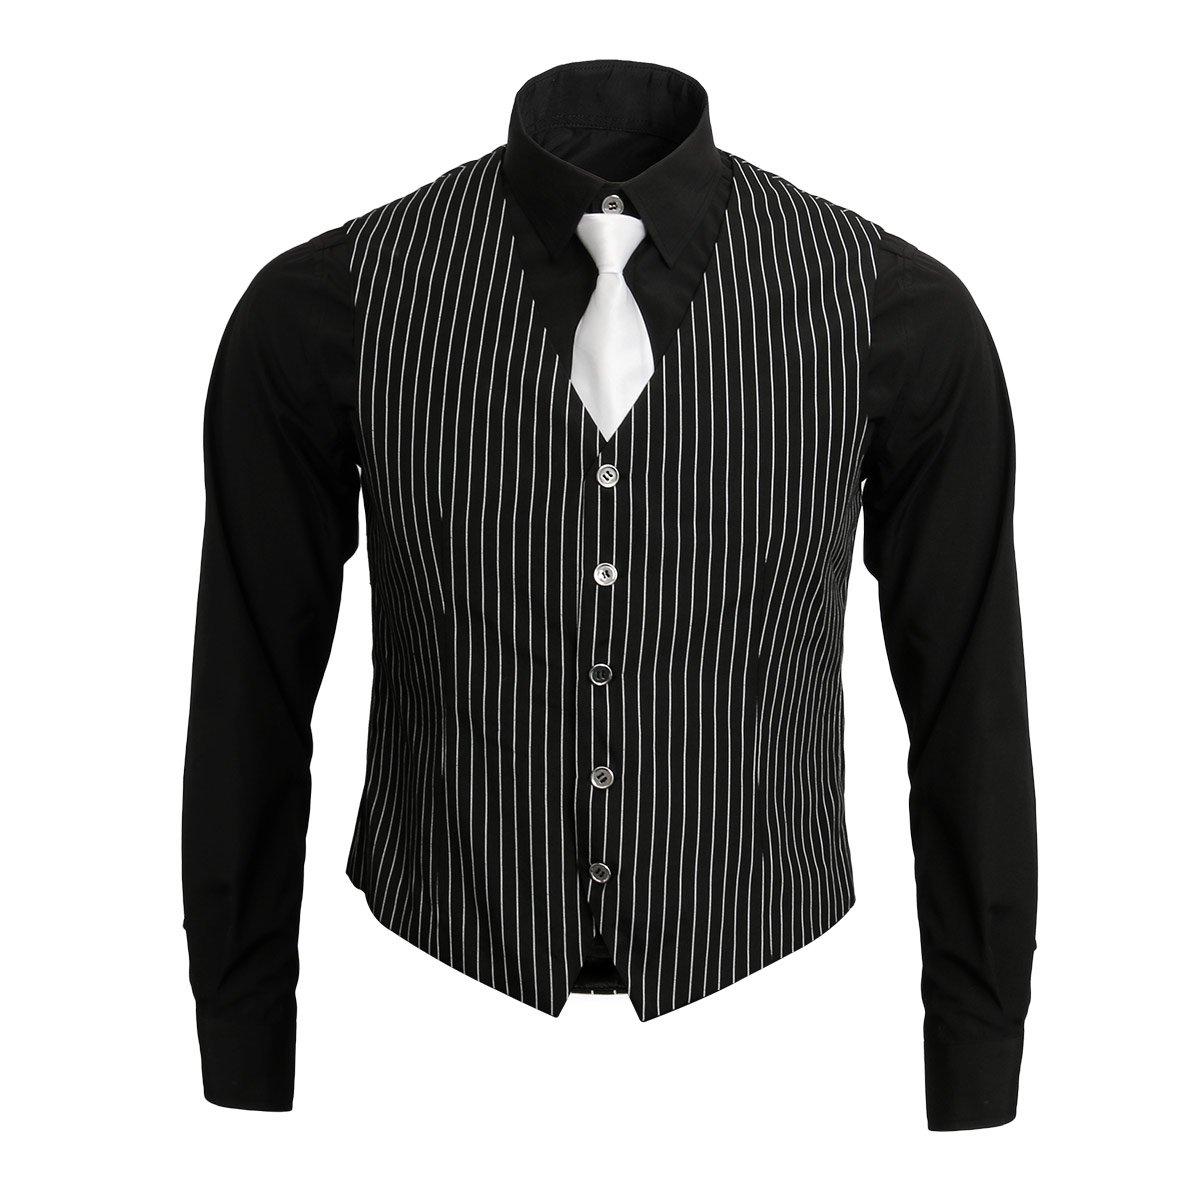 1920s Adult Men's Gangster Shirt, Vest and Tie Costume Accessories Set Roaring 20s Fancy Dress up Outfit Suit (X-Large)